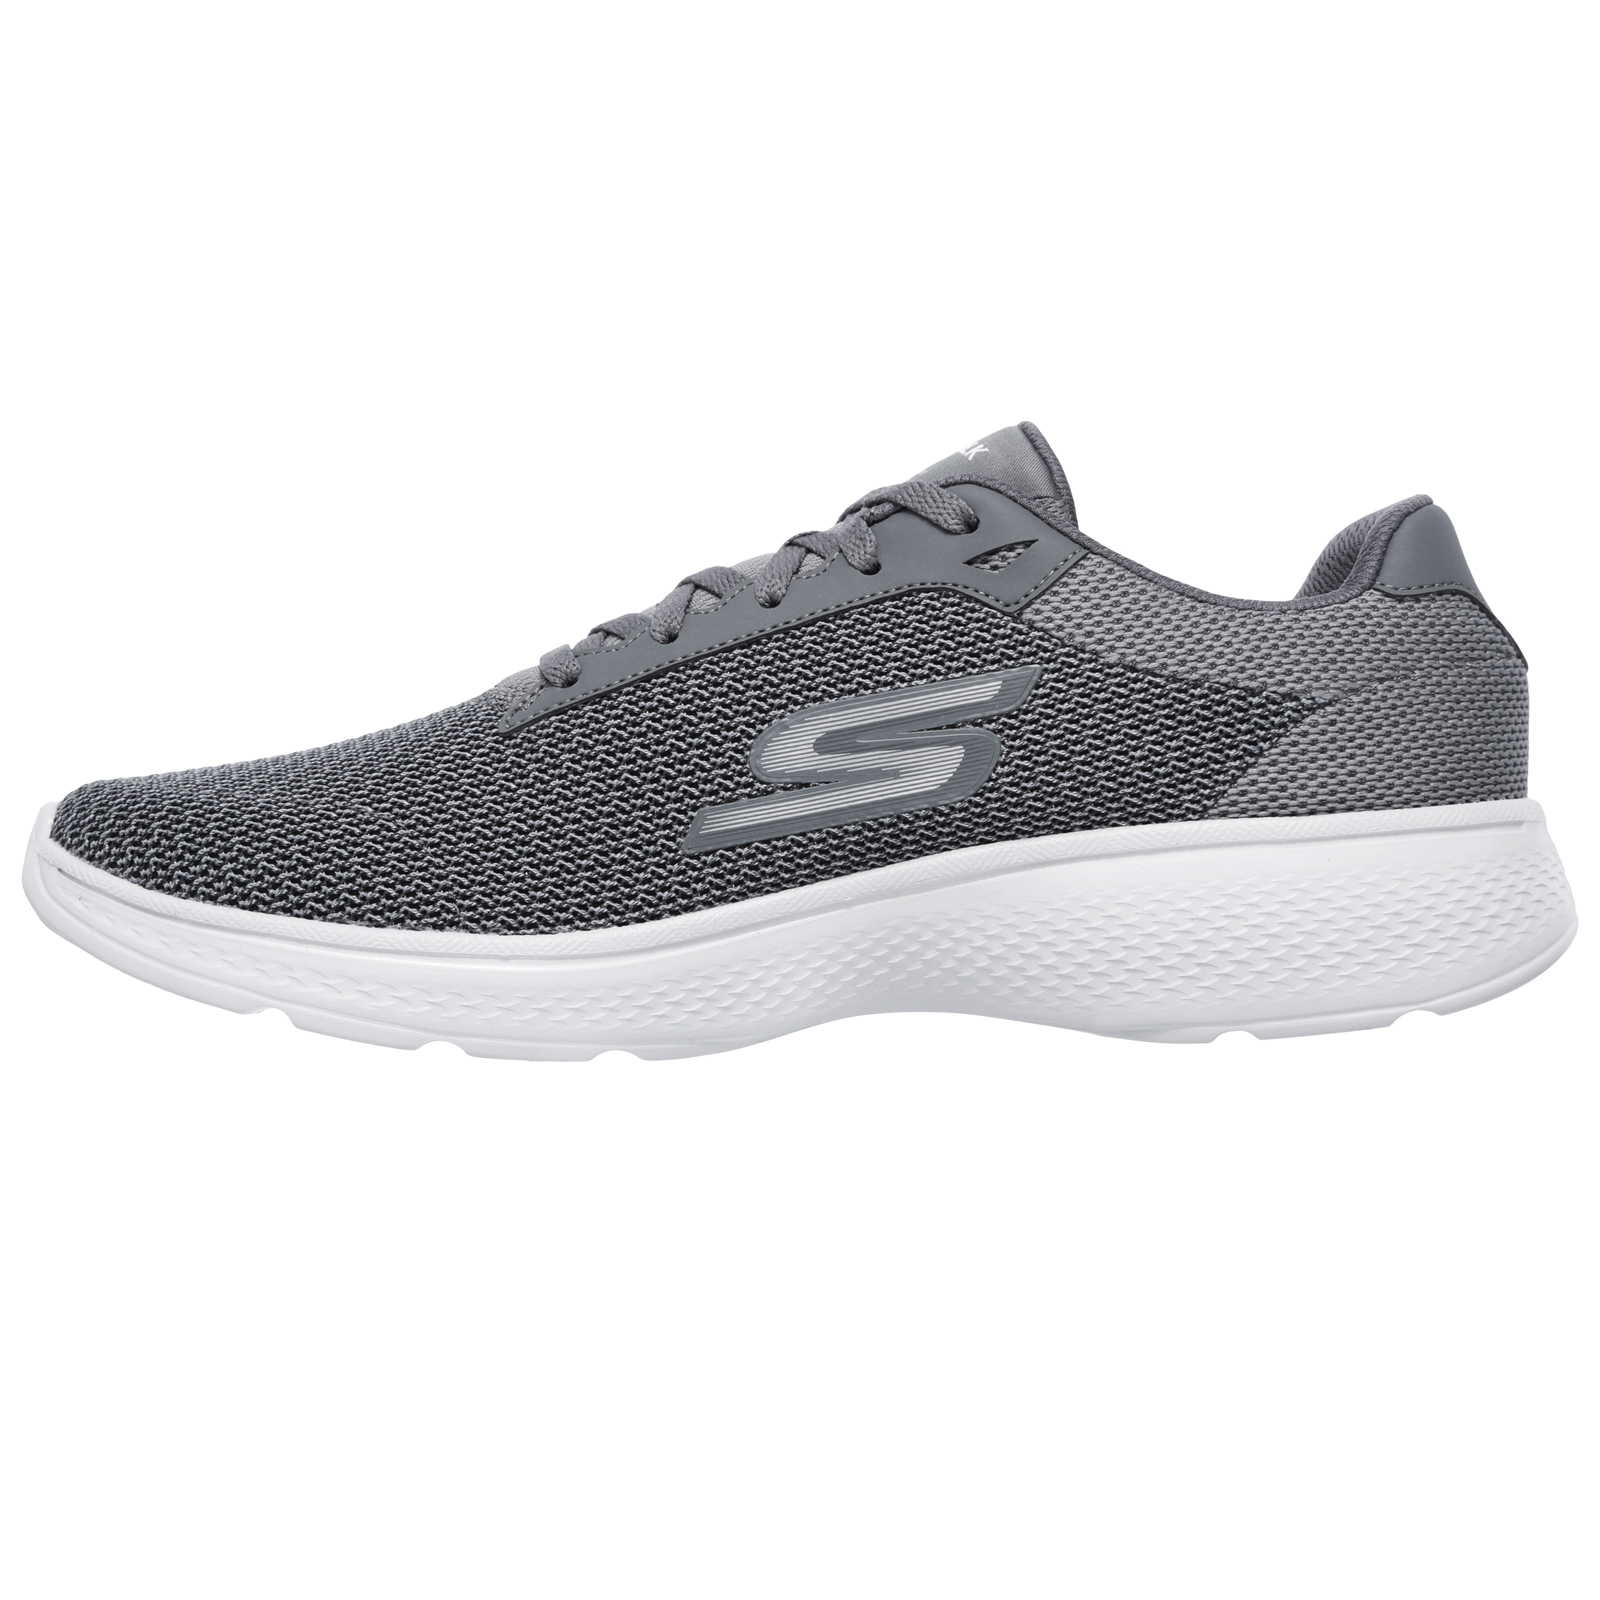 Carb Noble Up Espuma Skechers Zapatos Memoria Go Lace Walk 4 Designer Malla Entrenadores Mens xCXCqFO